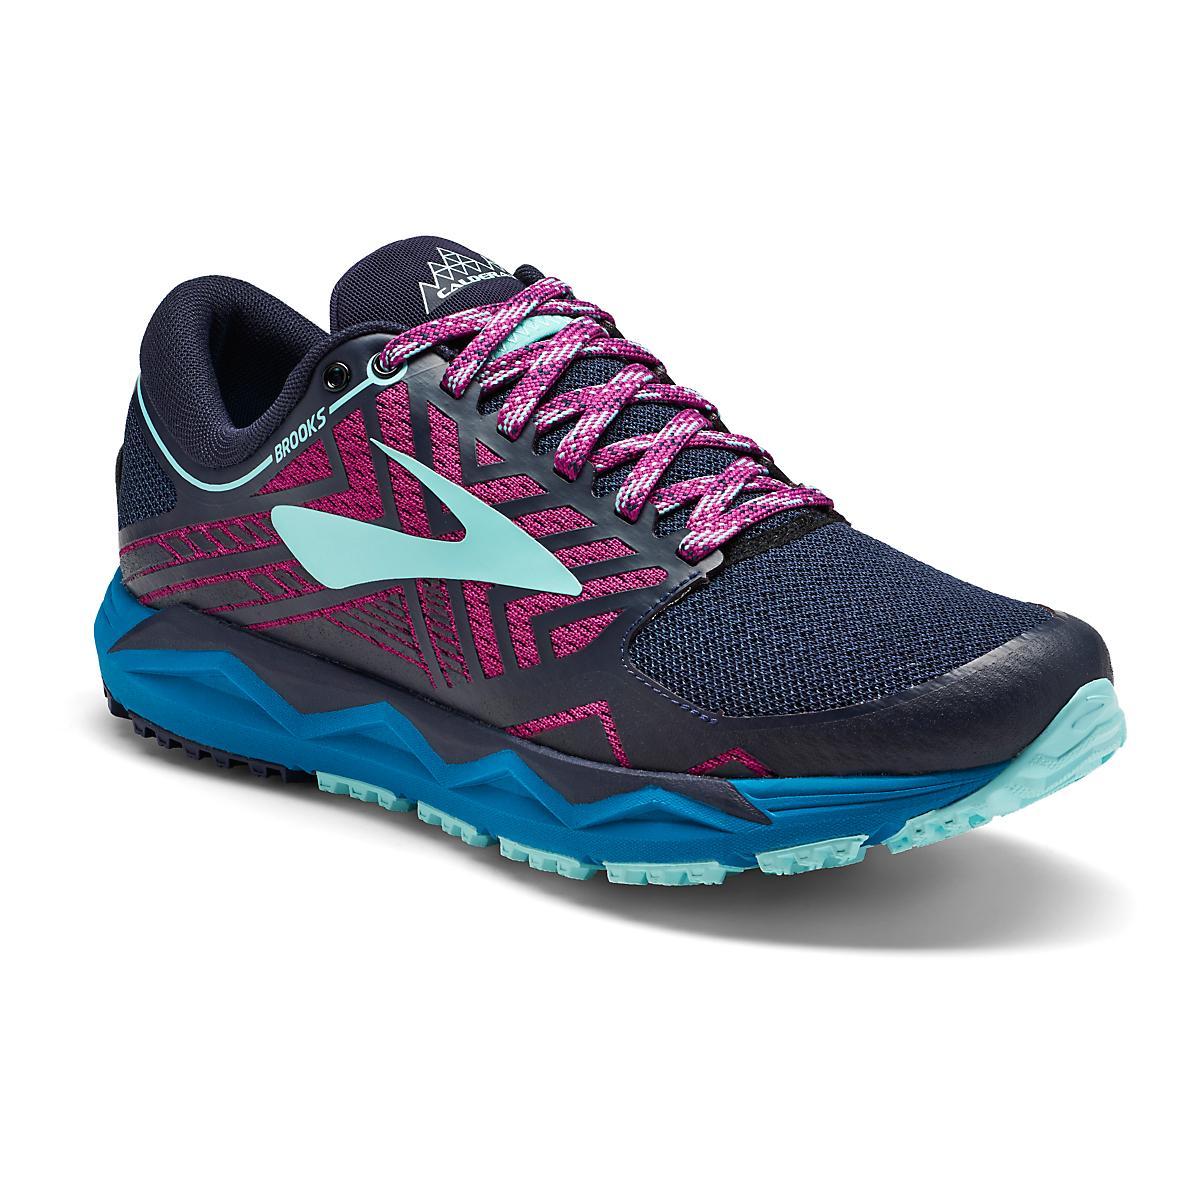 7c1d437cbc6 Womens Brooks Caldera 2 Trail Running Shoe at Road Runner Sports